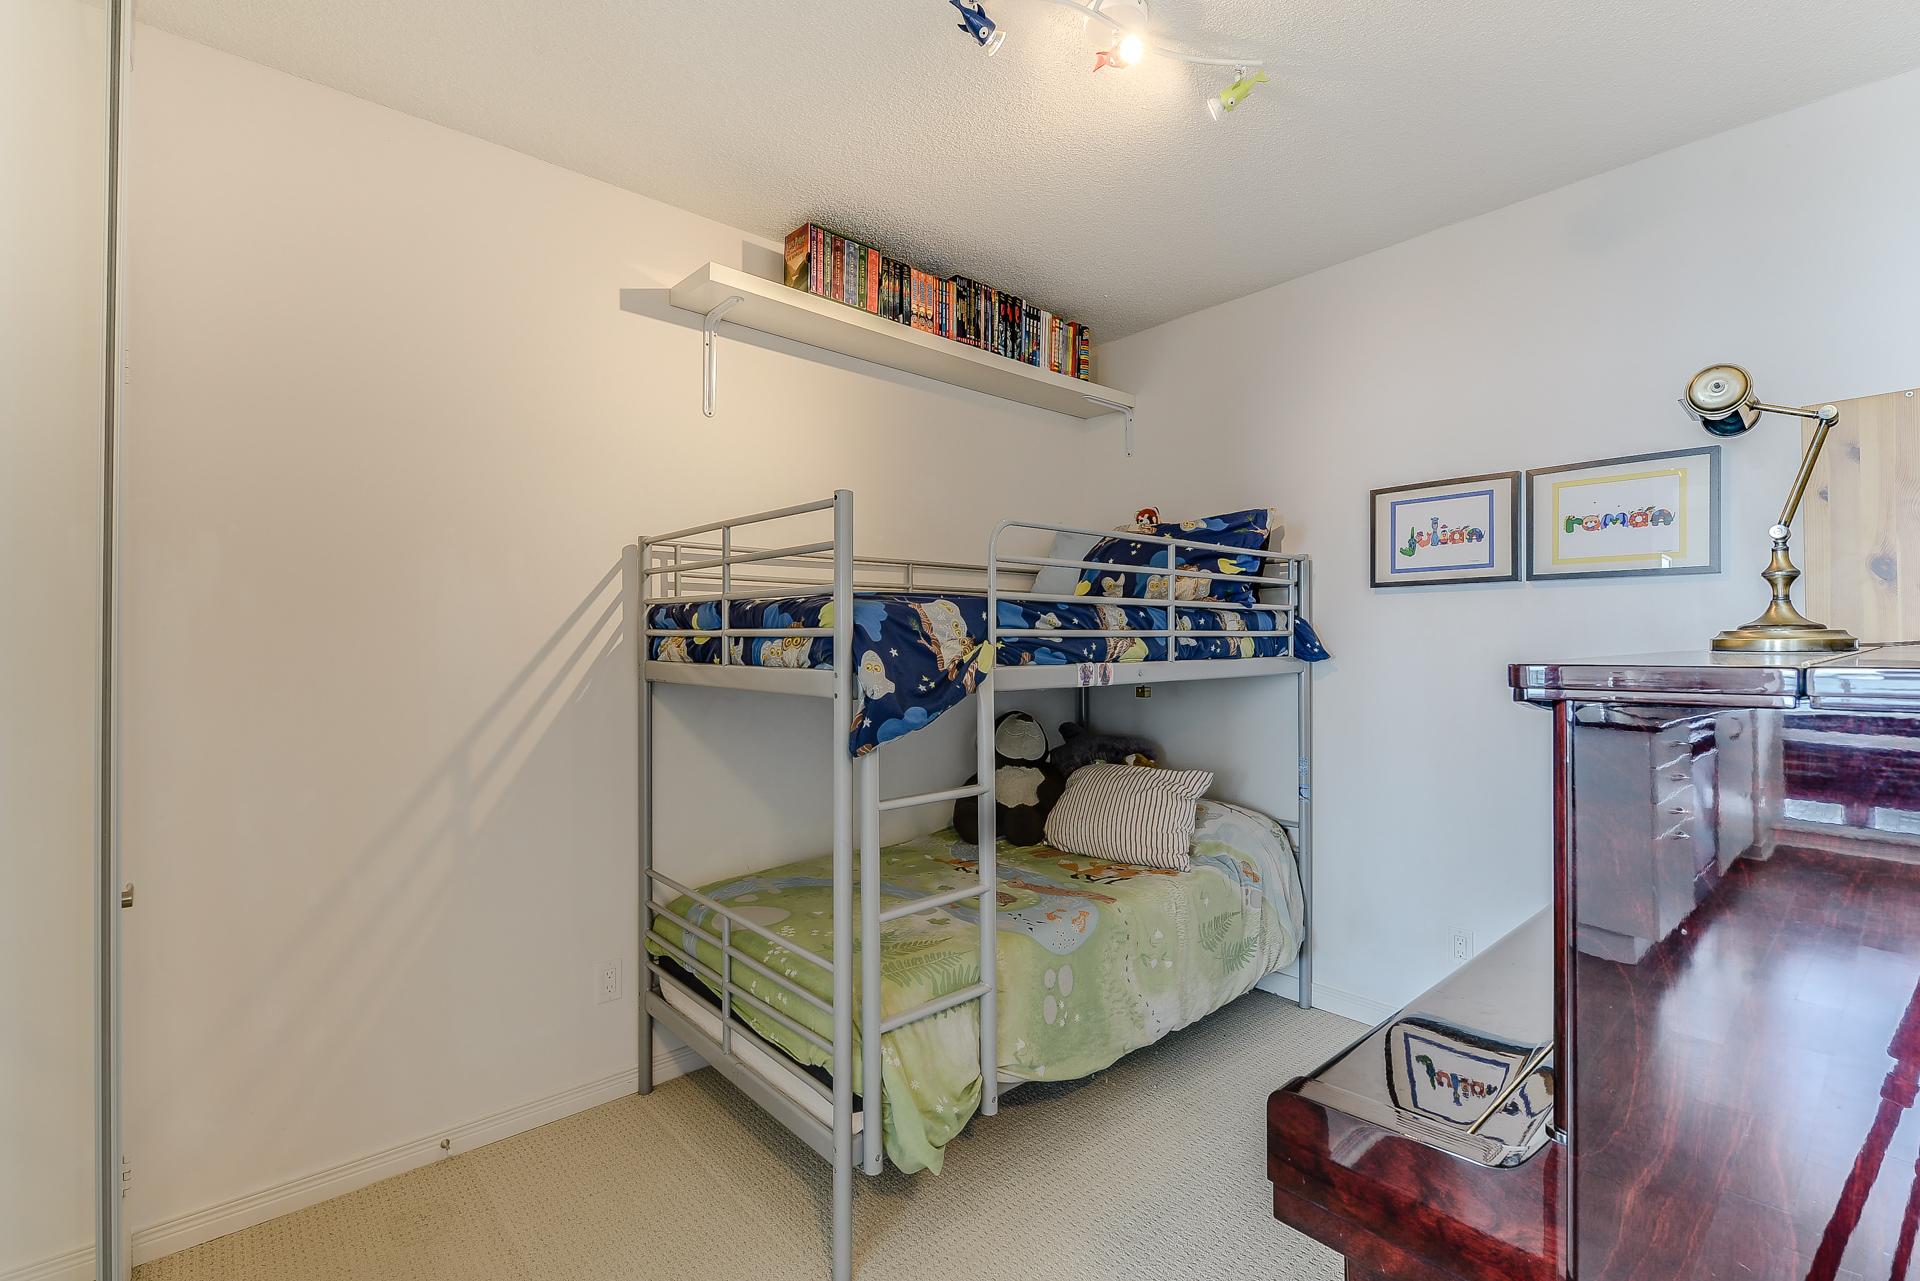 29_second_bedroom2.jpg